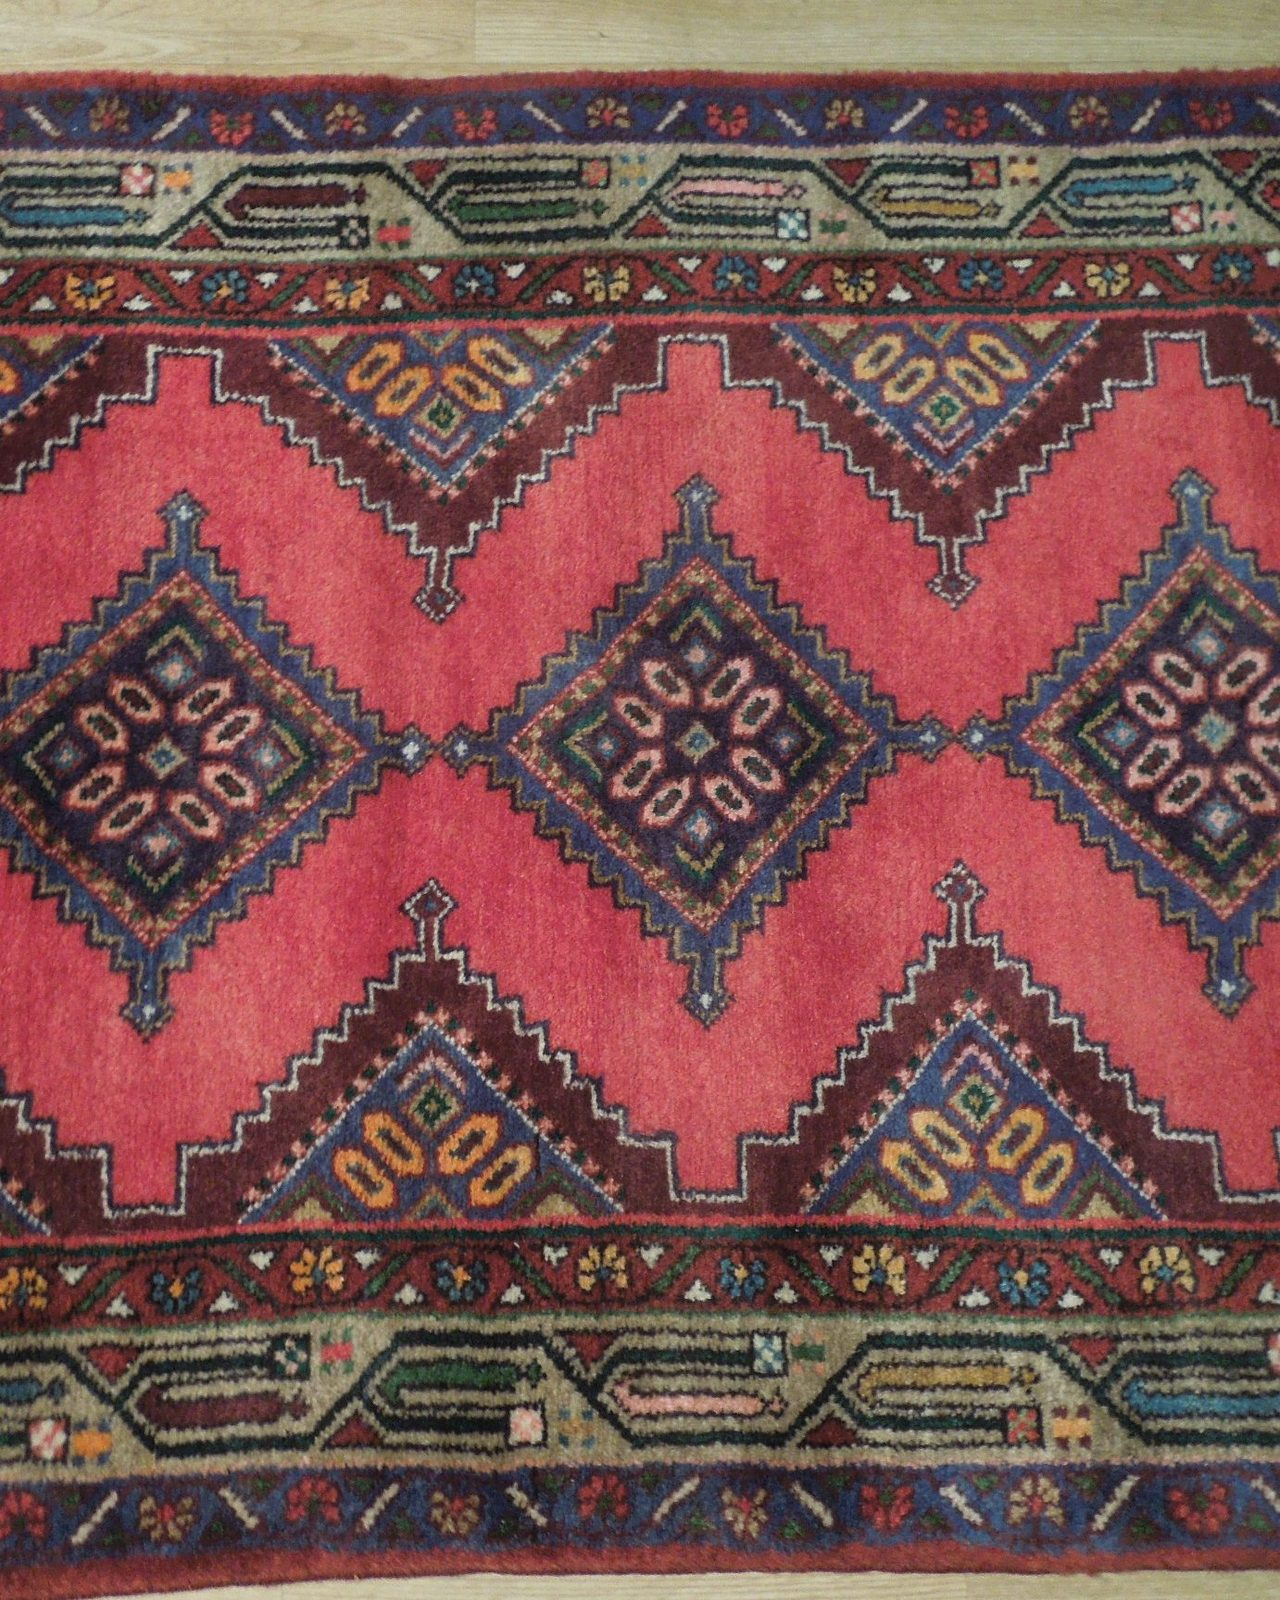 Pink Hamadan Persian Wool Handmade Rug 3x9 All-Over Geometric Rug image 11